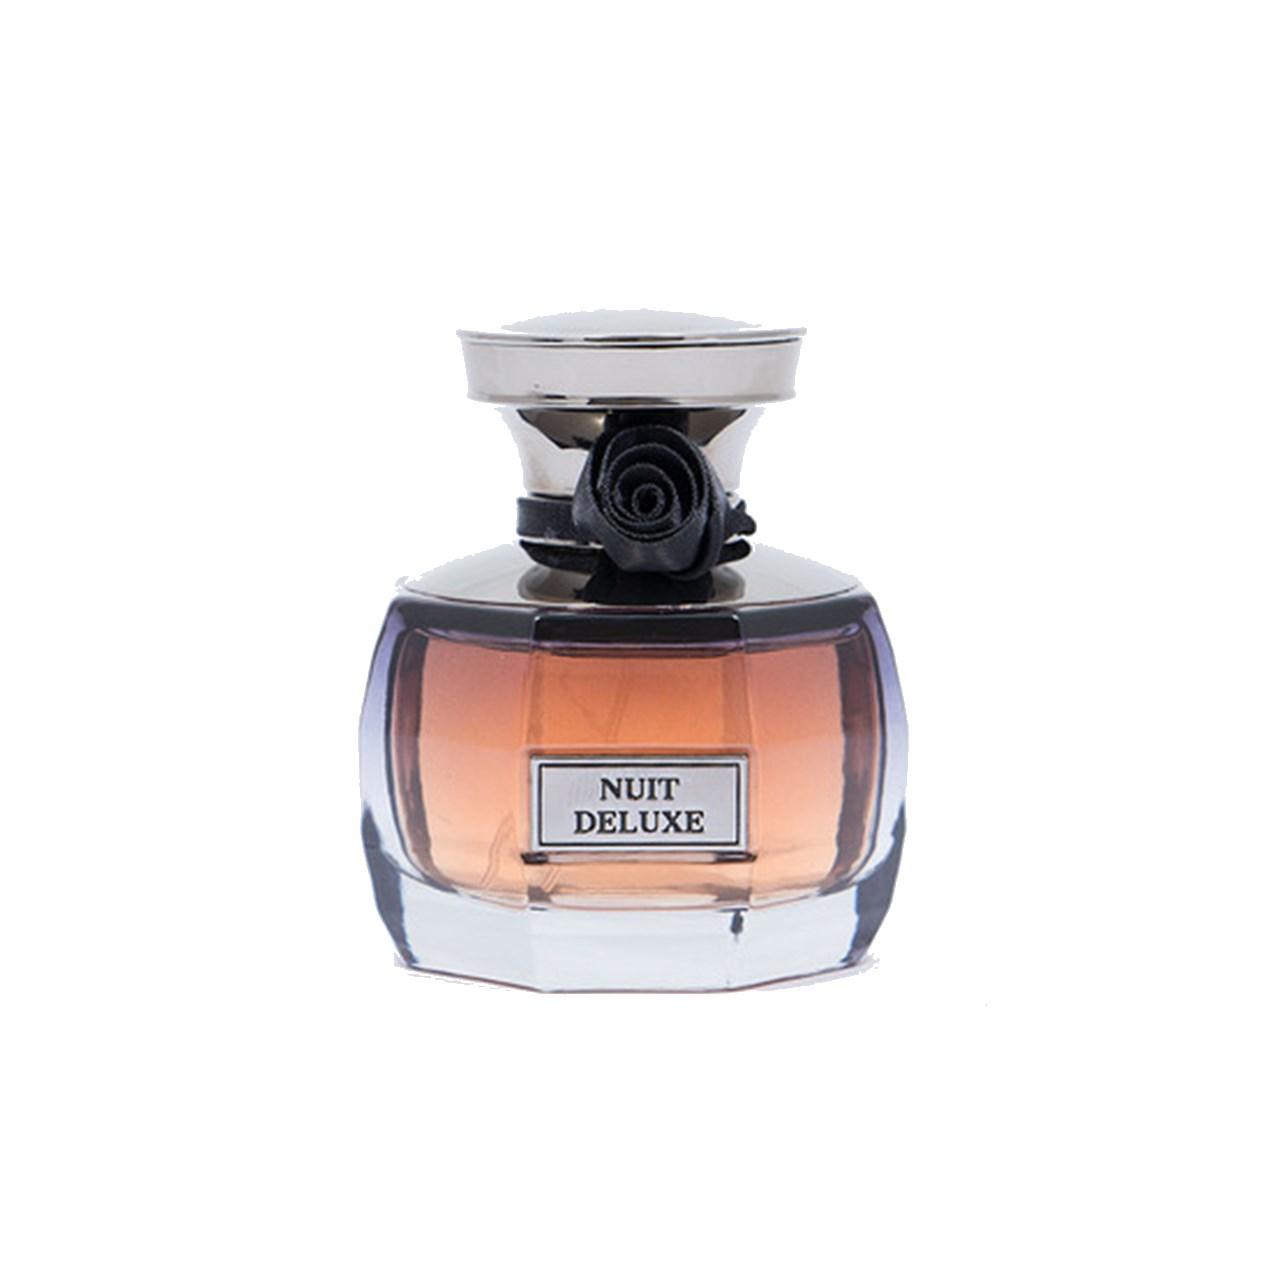 قیمت ادو پرفیوم زنانه مای پرفیومز مدل Nuit Deluxe حجم 100 میلی لیتر